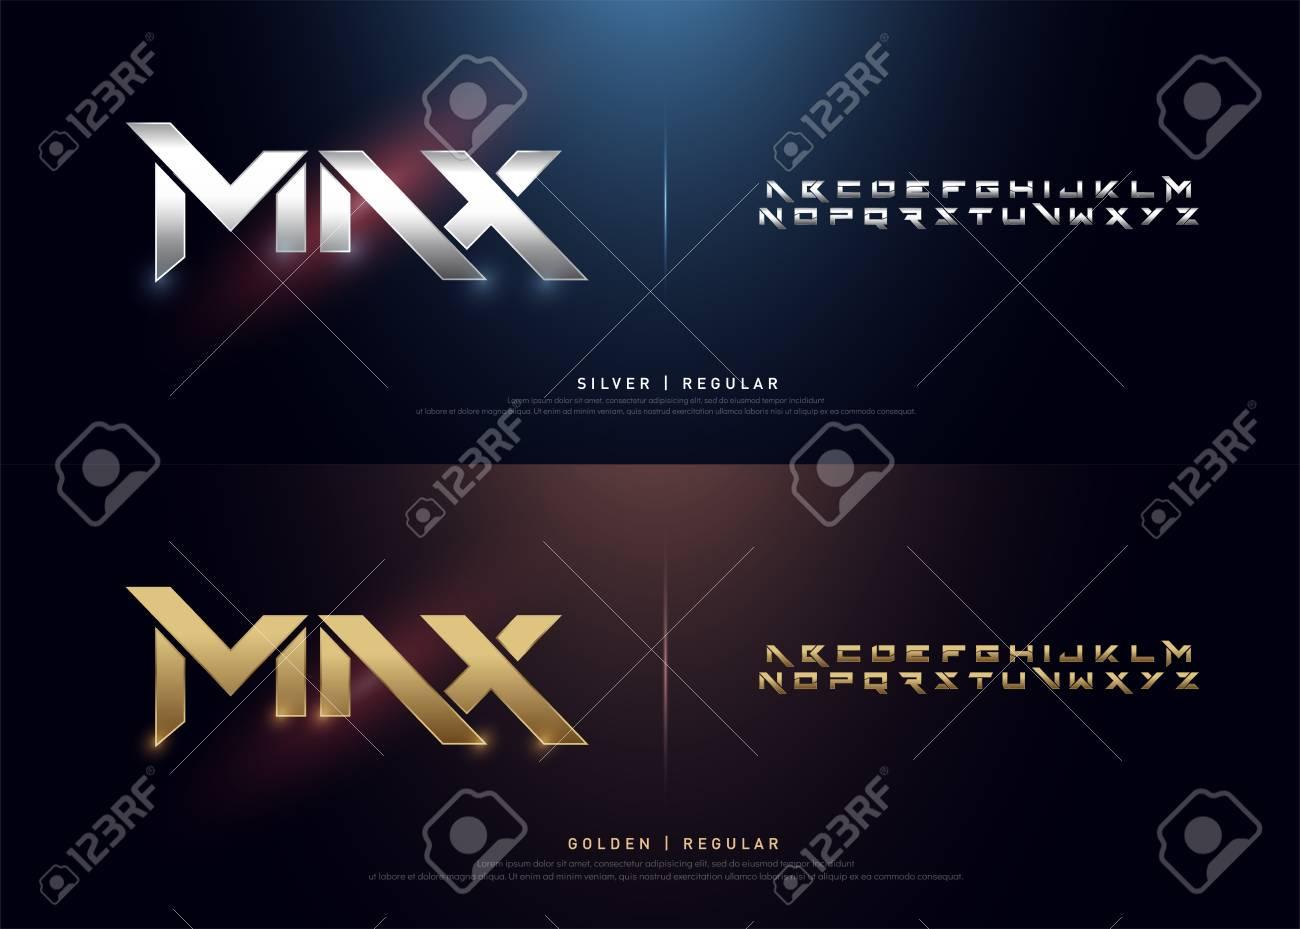 Elegant Silver and Golden Colored Metal Chrome Alphabet Font. Typography modern style gold font set for logo, Poster, Movie. vector illustration - 107410398